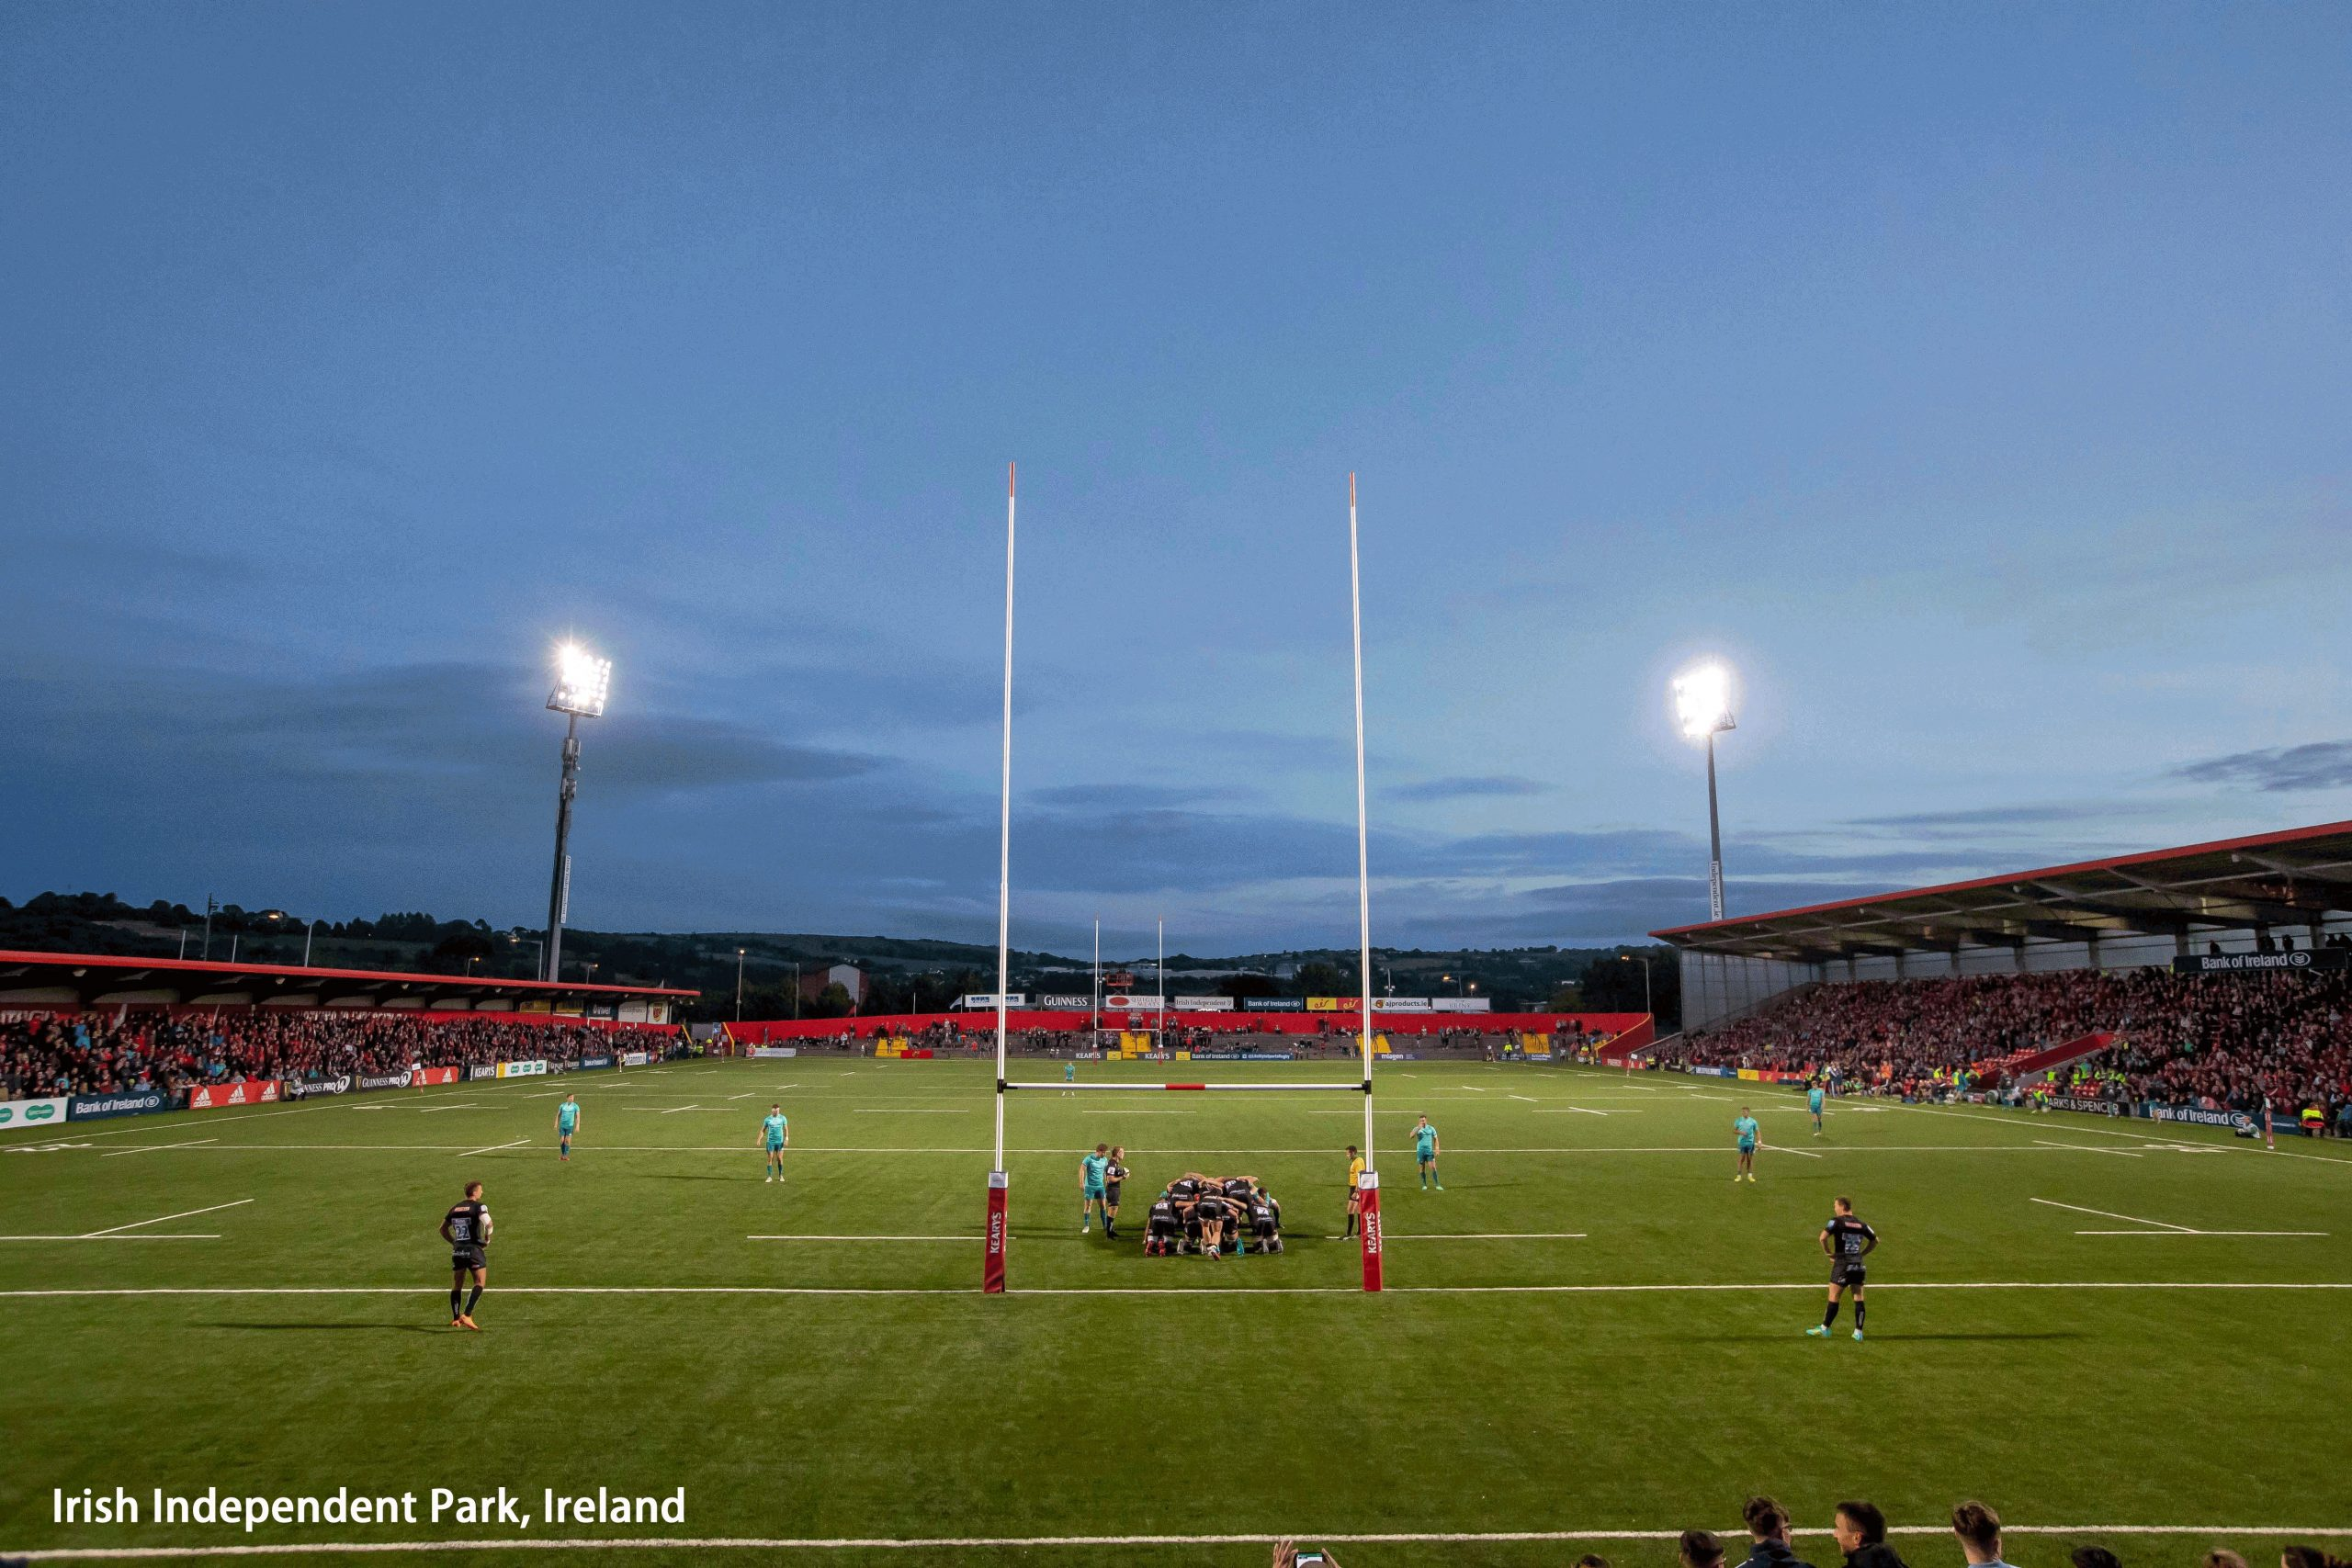 Irish Independent Park, Munster Rugby